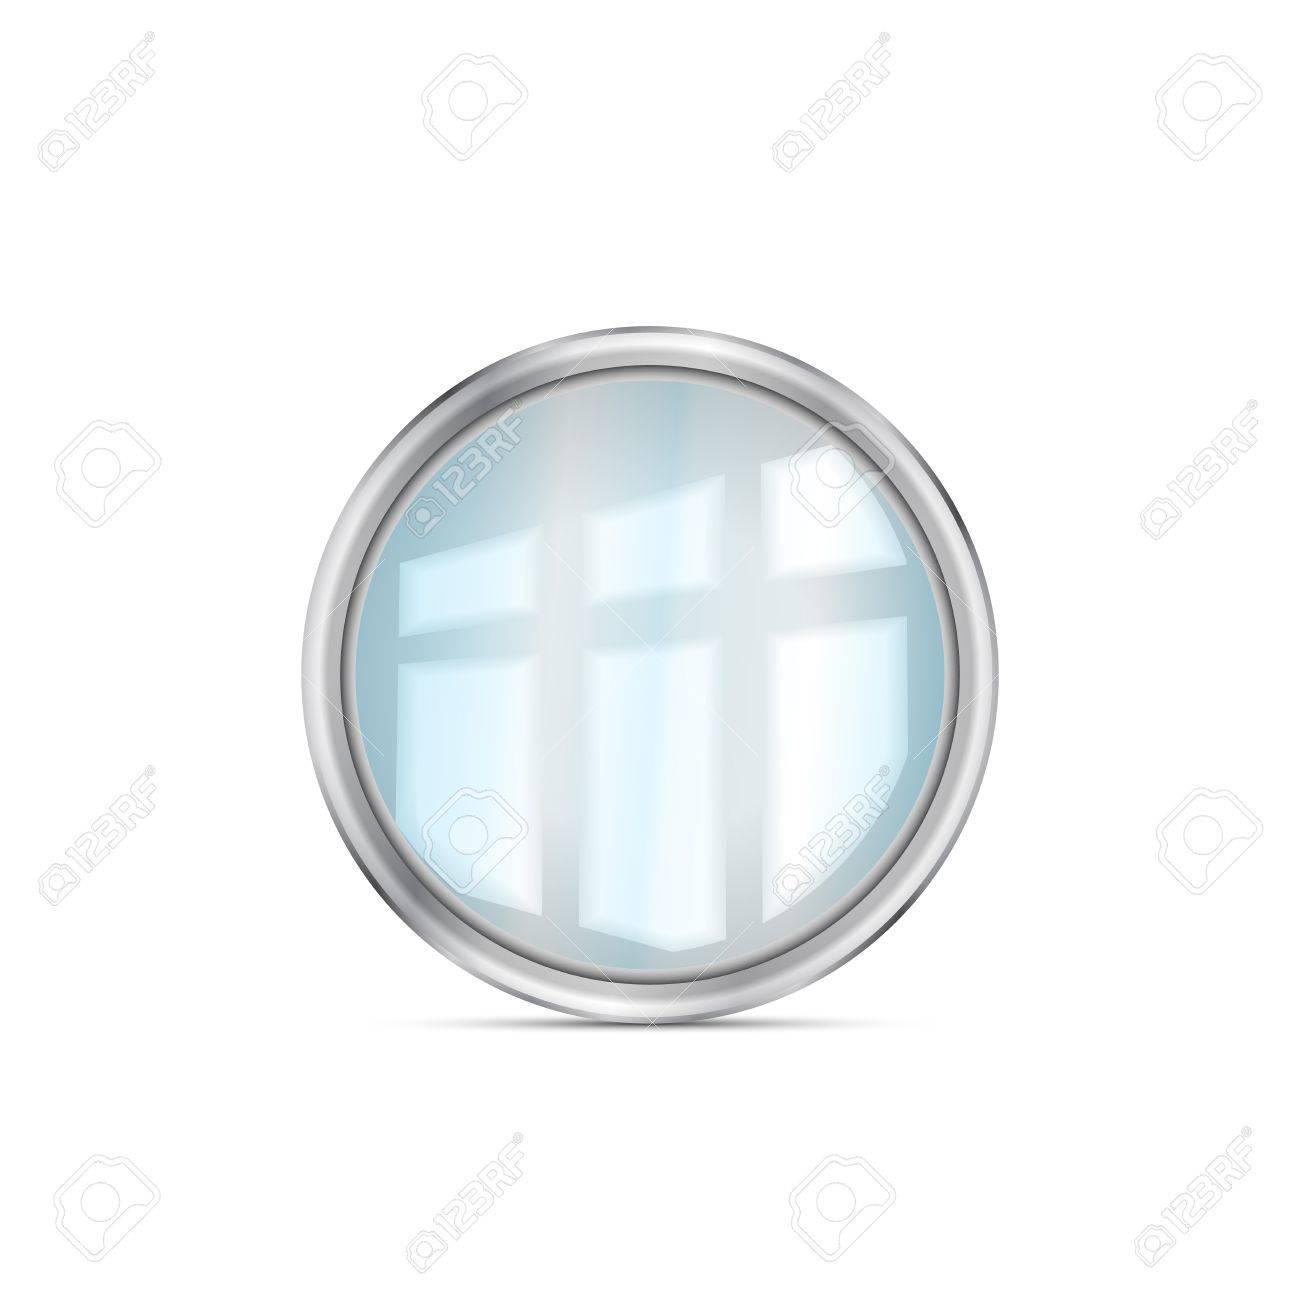 Mirror isolated Stock Vector - 18619483